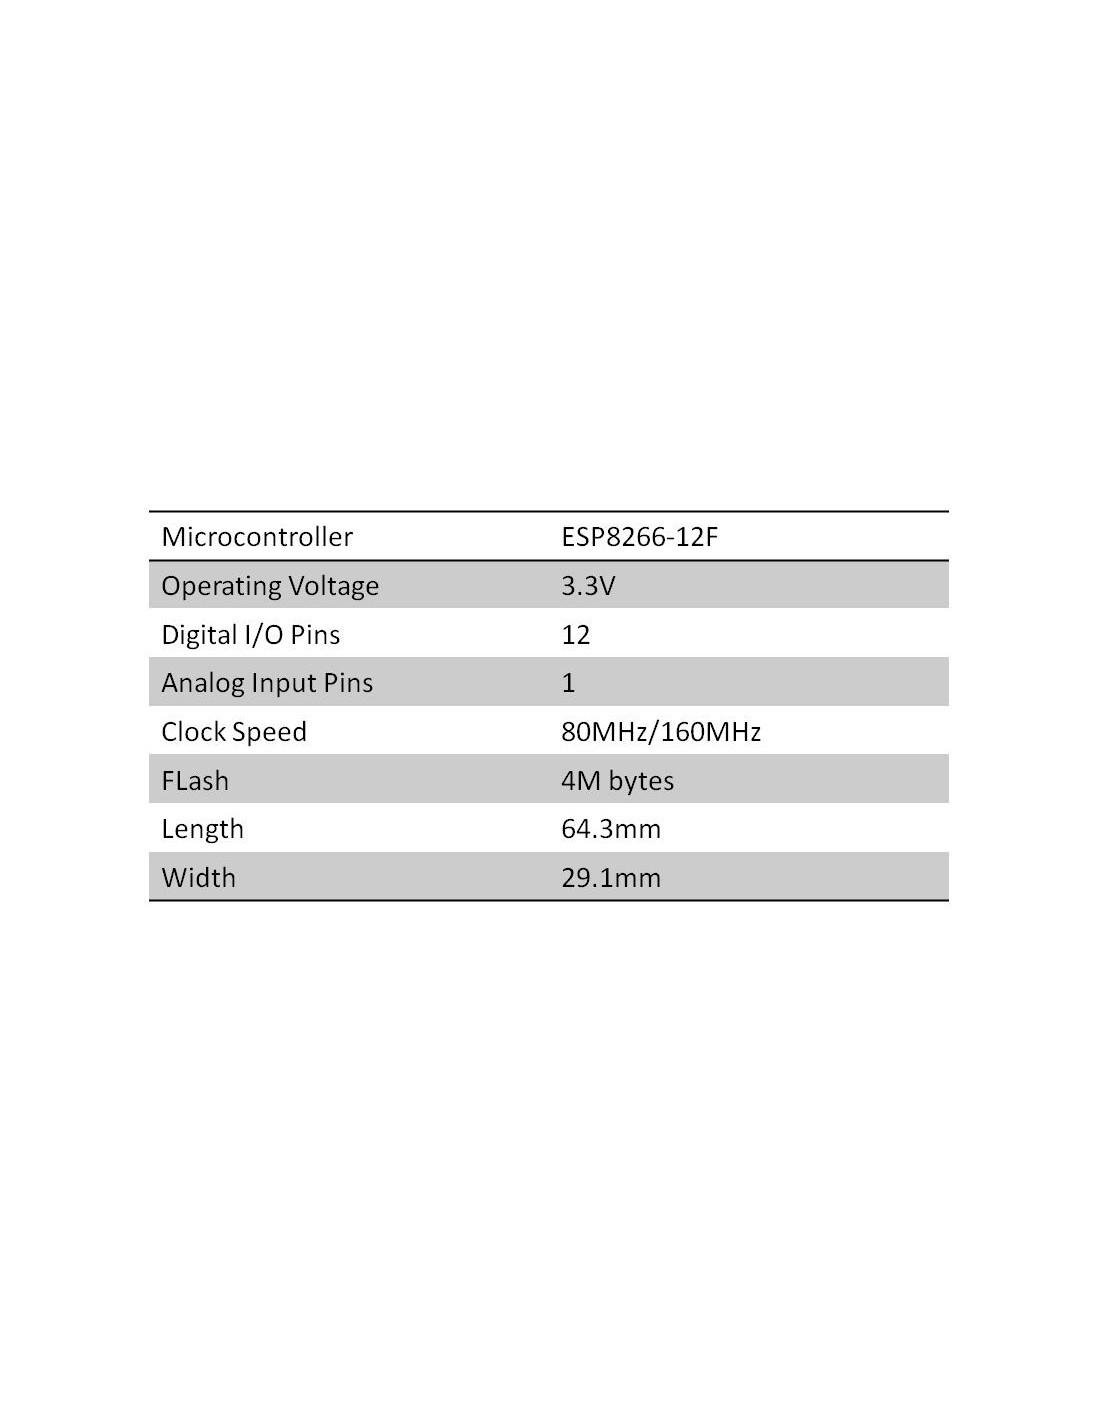 D-DUINO OLED 0 96 (ESP8266, WIFI, 32bit mcu)